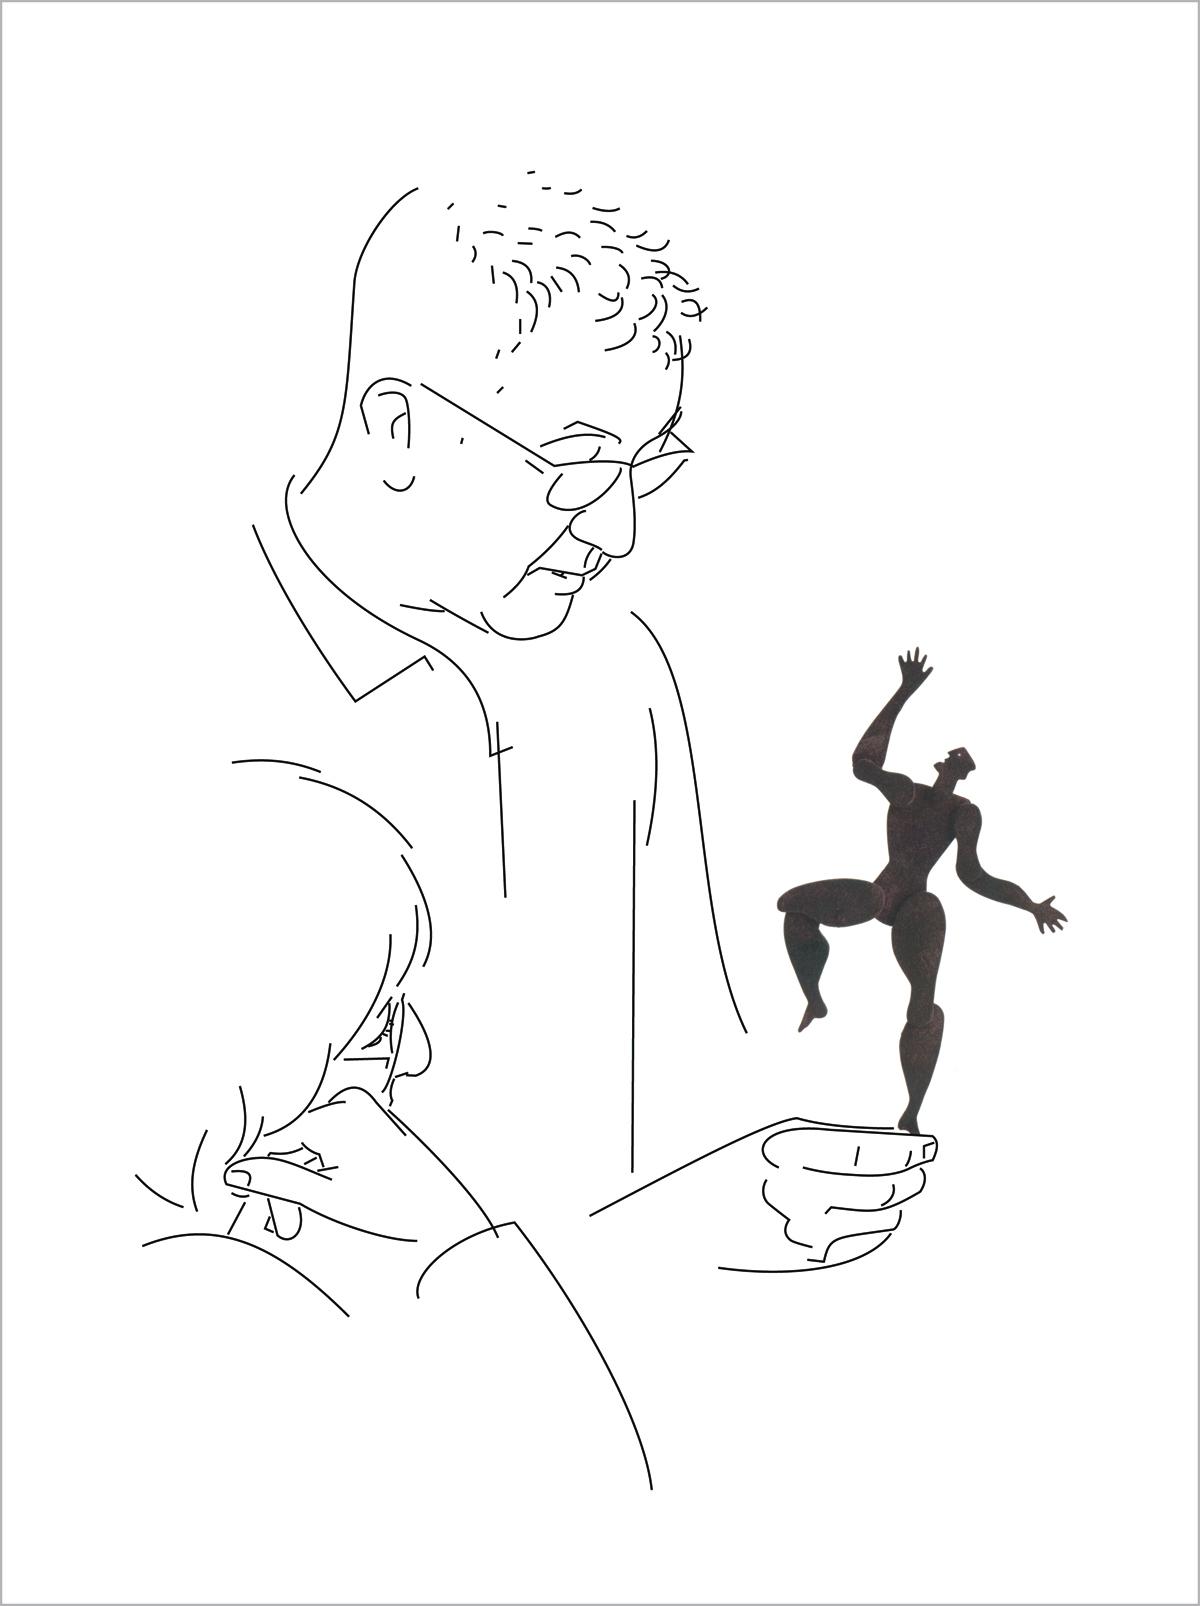 """BascuBlues ÑánÑam"", homenaje a Paco Bascuñán. de Paco Giménez, 2010"